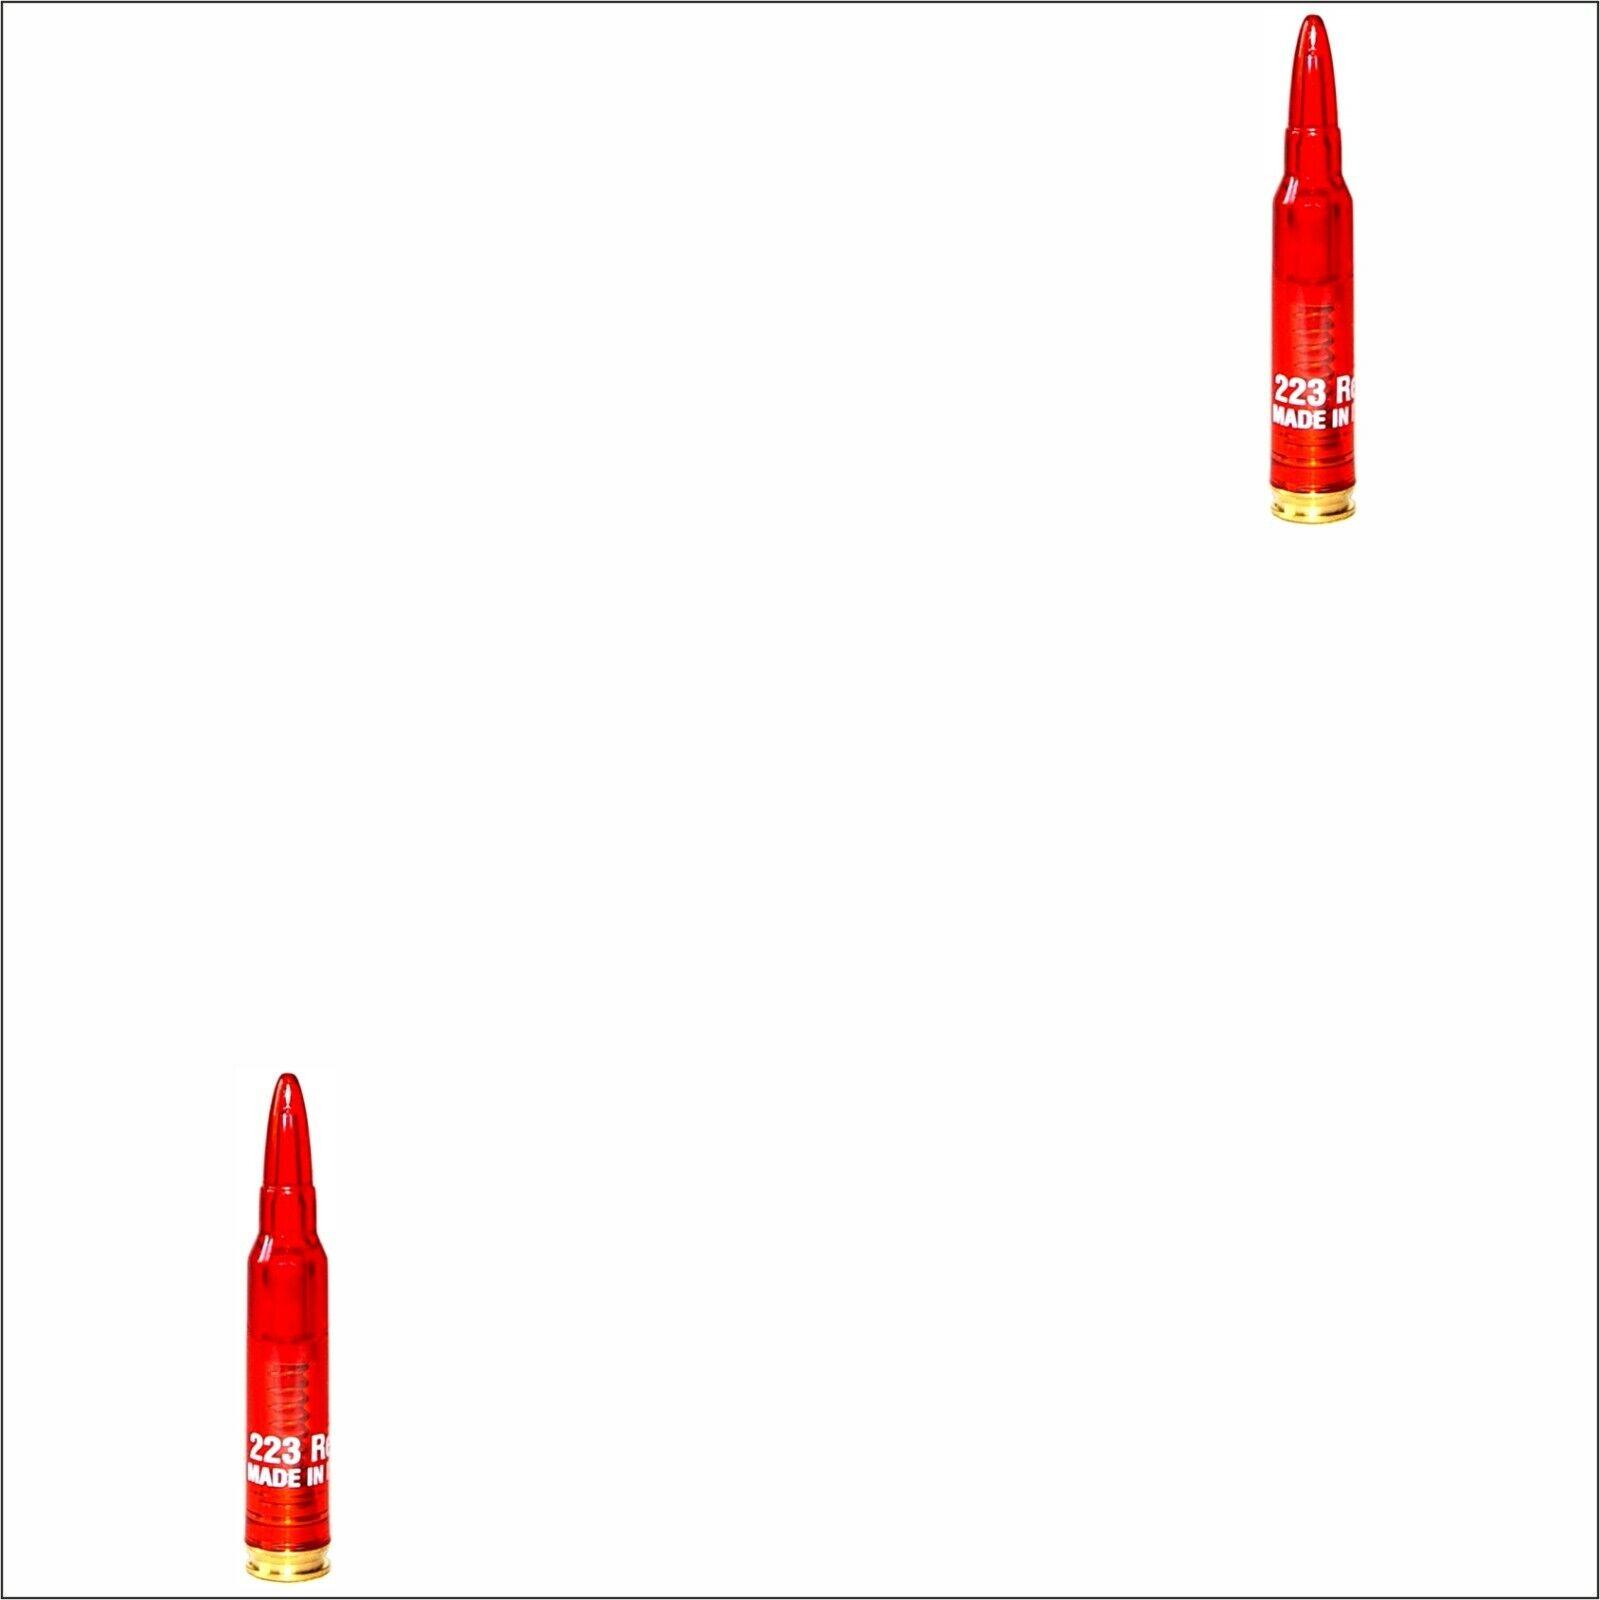 Pufferpatronen .223 Rem Kunststoff // Messing Pufferpatrone 2 St/ück